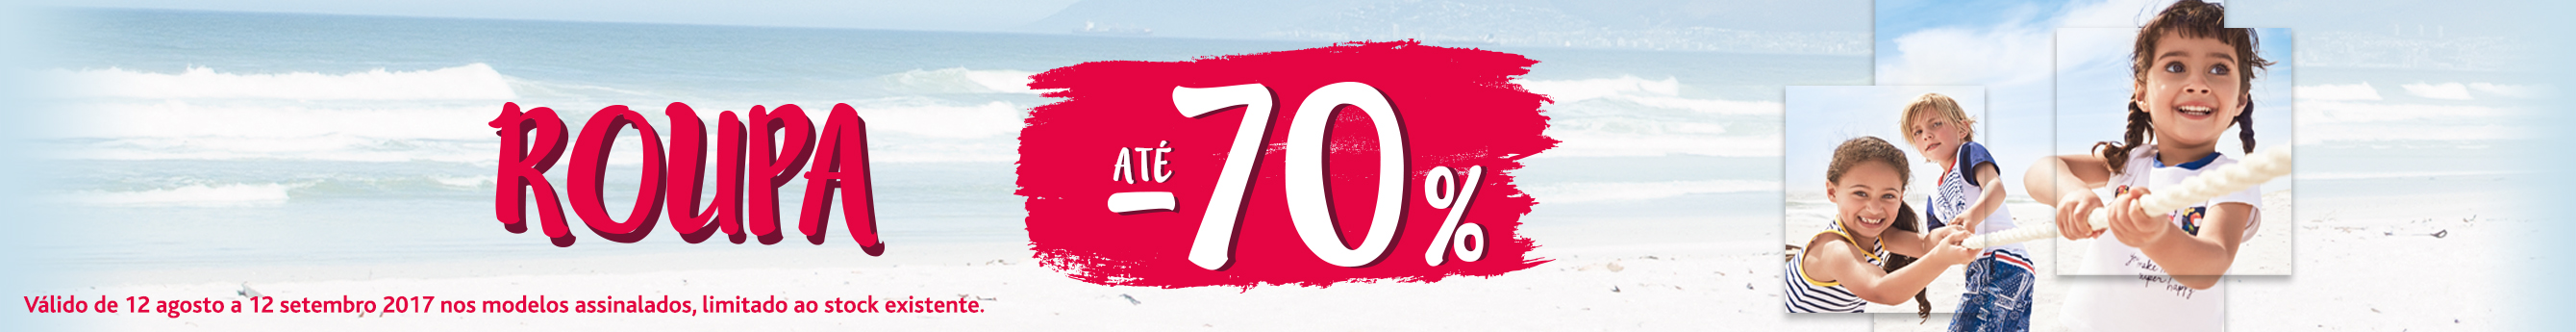 Promoções Roupa até -70%